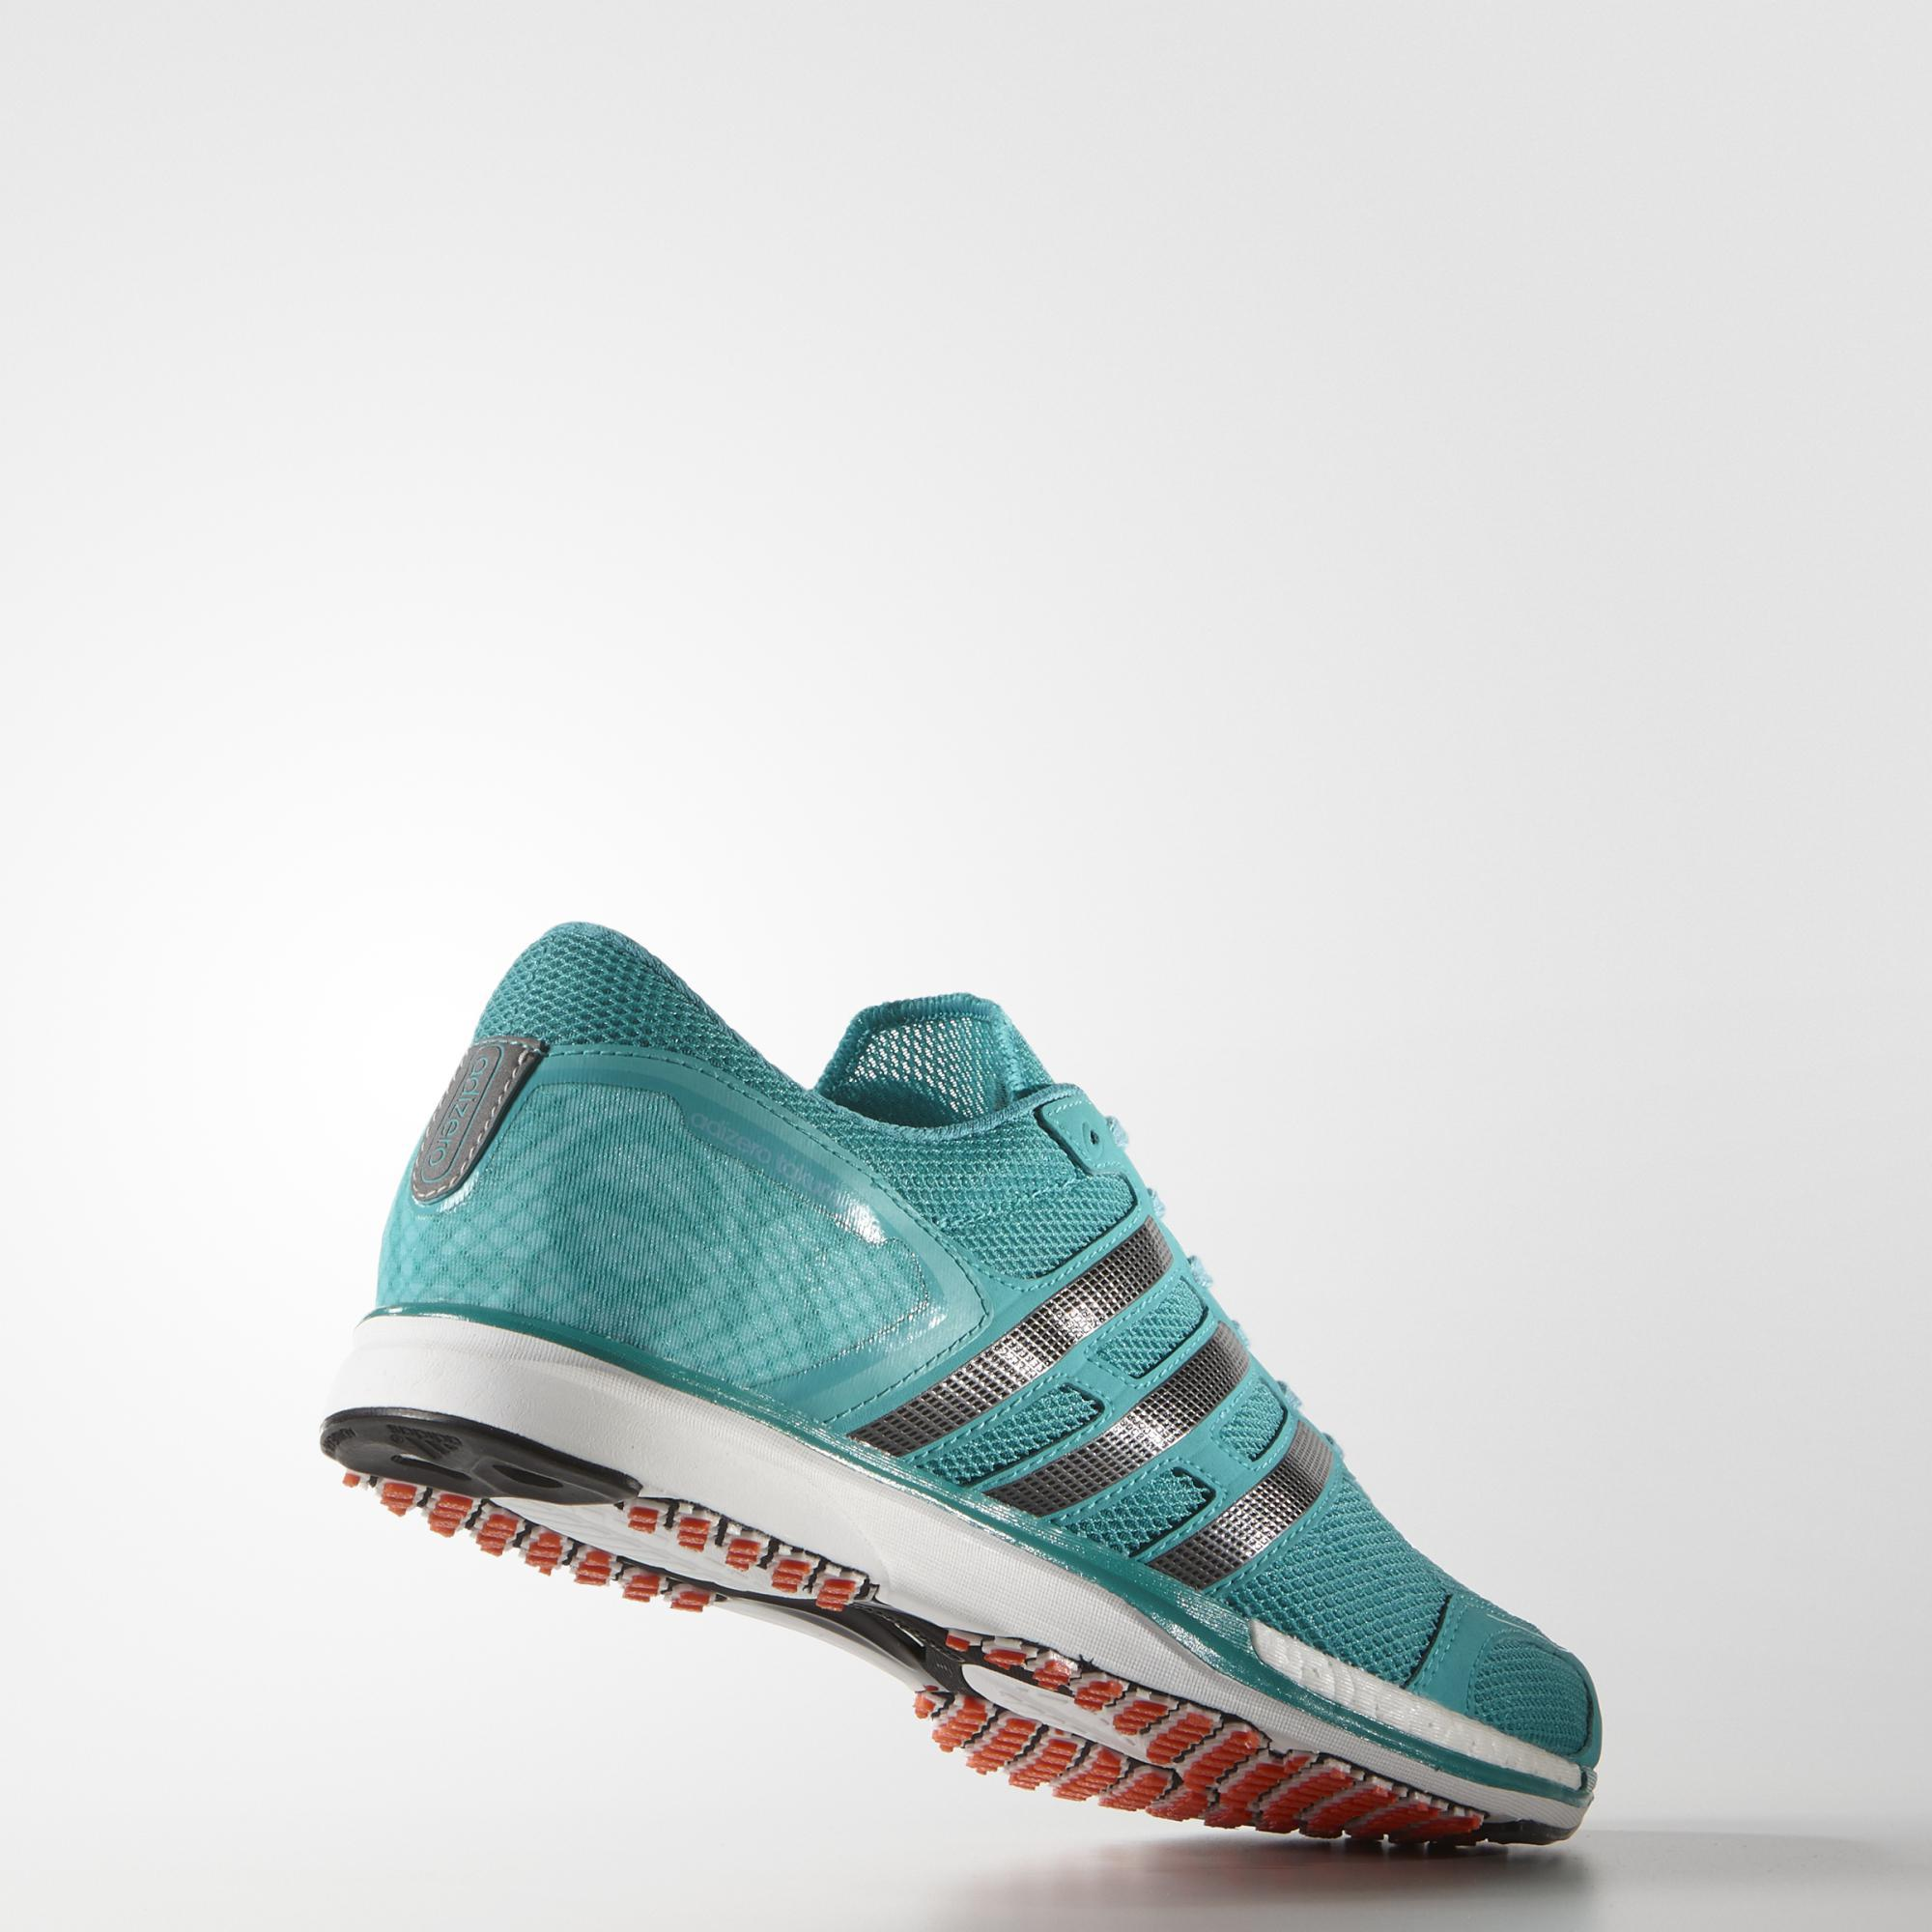 31740d00747 Adidas Mens Adizero Takumi Sen 3 Running Shoes - Shock Green ...